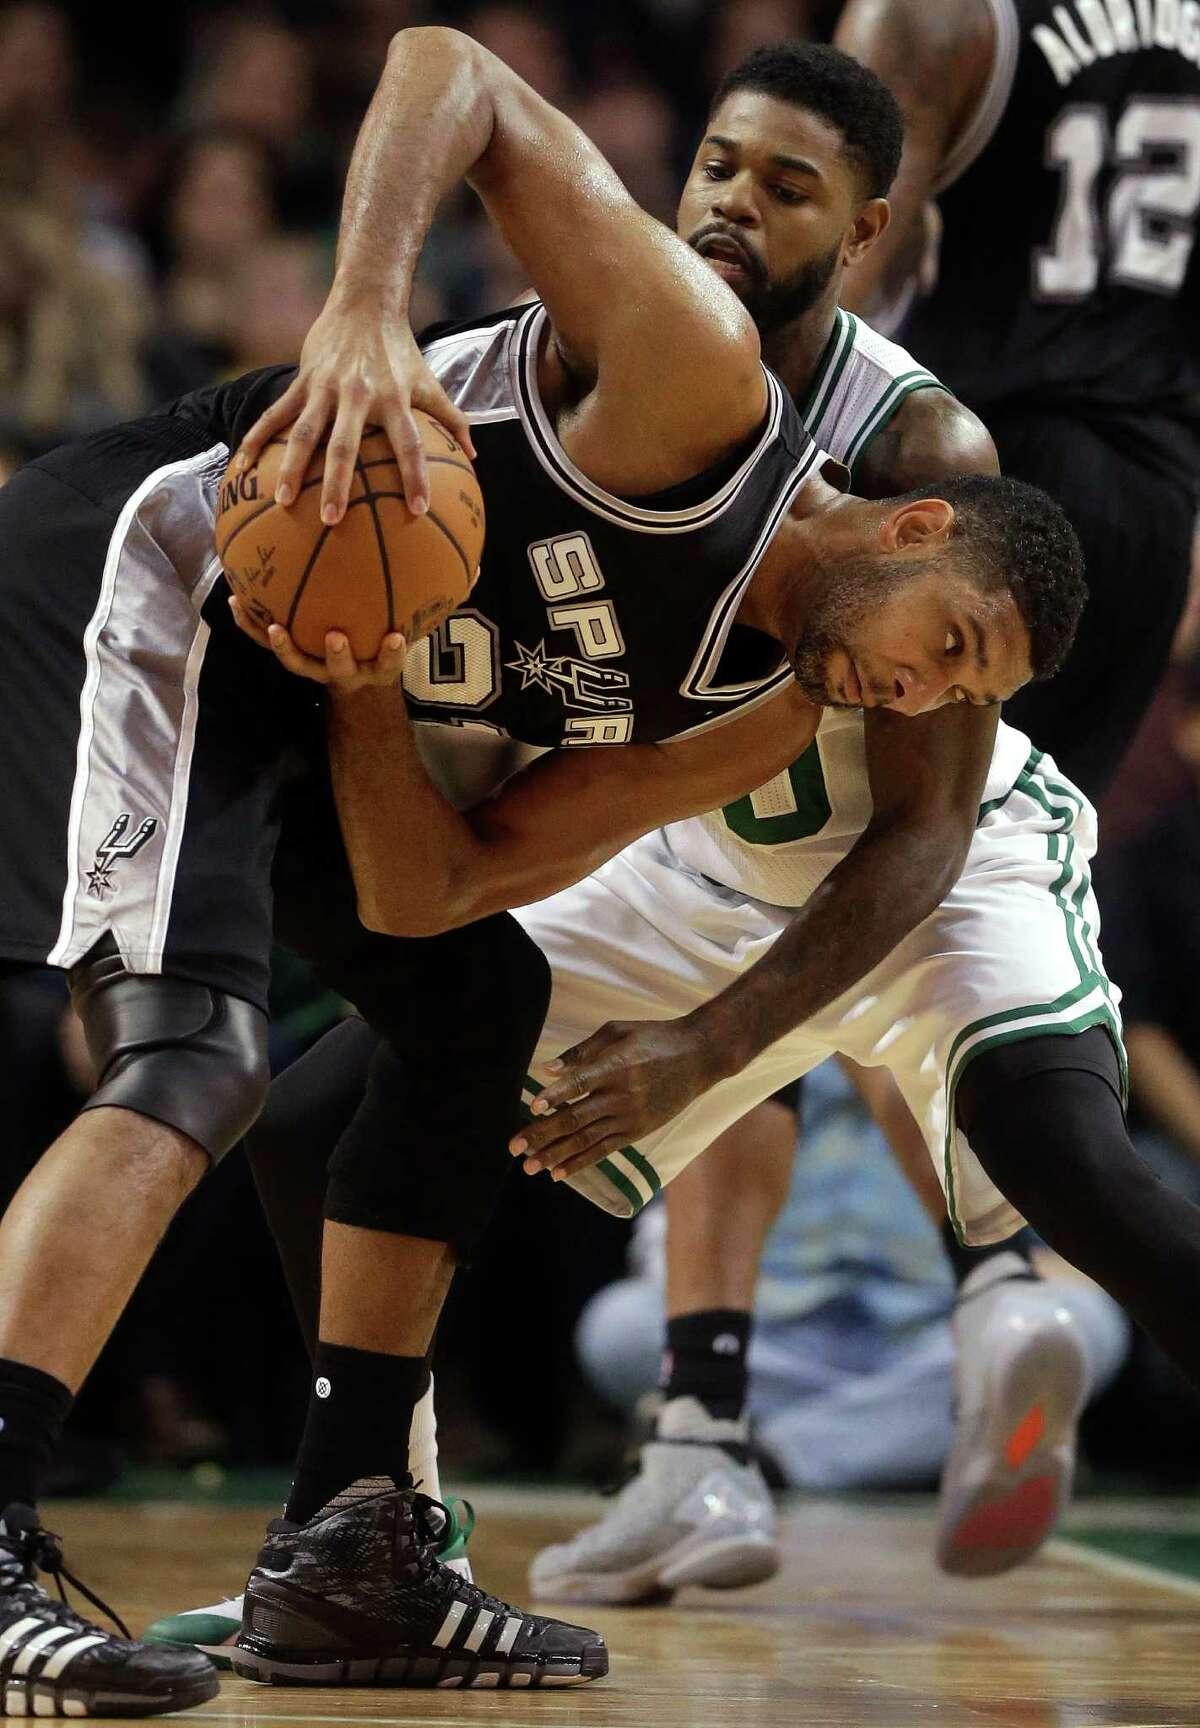 San Antonio Spurs forward Tim Duncan, front, tries to drive past Boston Celtics forward Amir Johnson, behind, in the third quarter of an NBA basketball game, Sunday, Nov. 1, 2015, in Boston. The Spurs won 95-87. (AP Photo/Steven Senne)